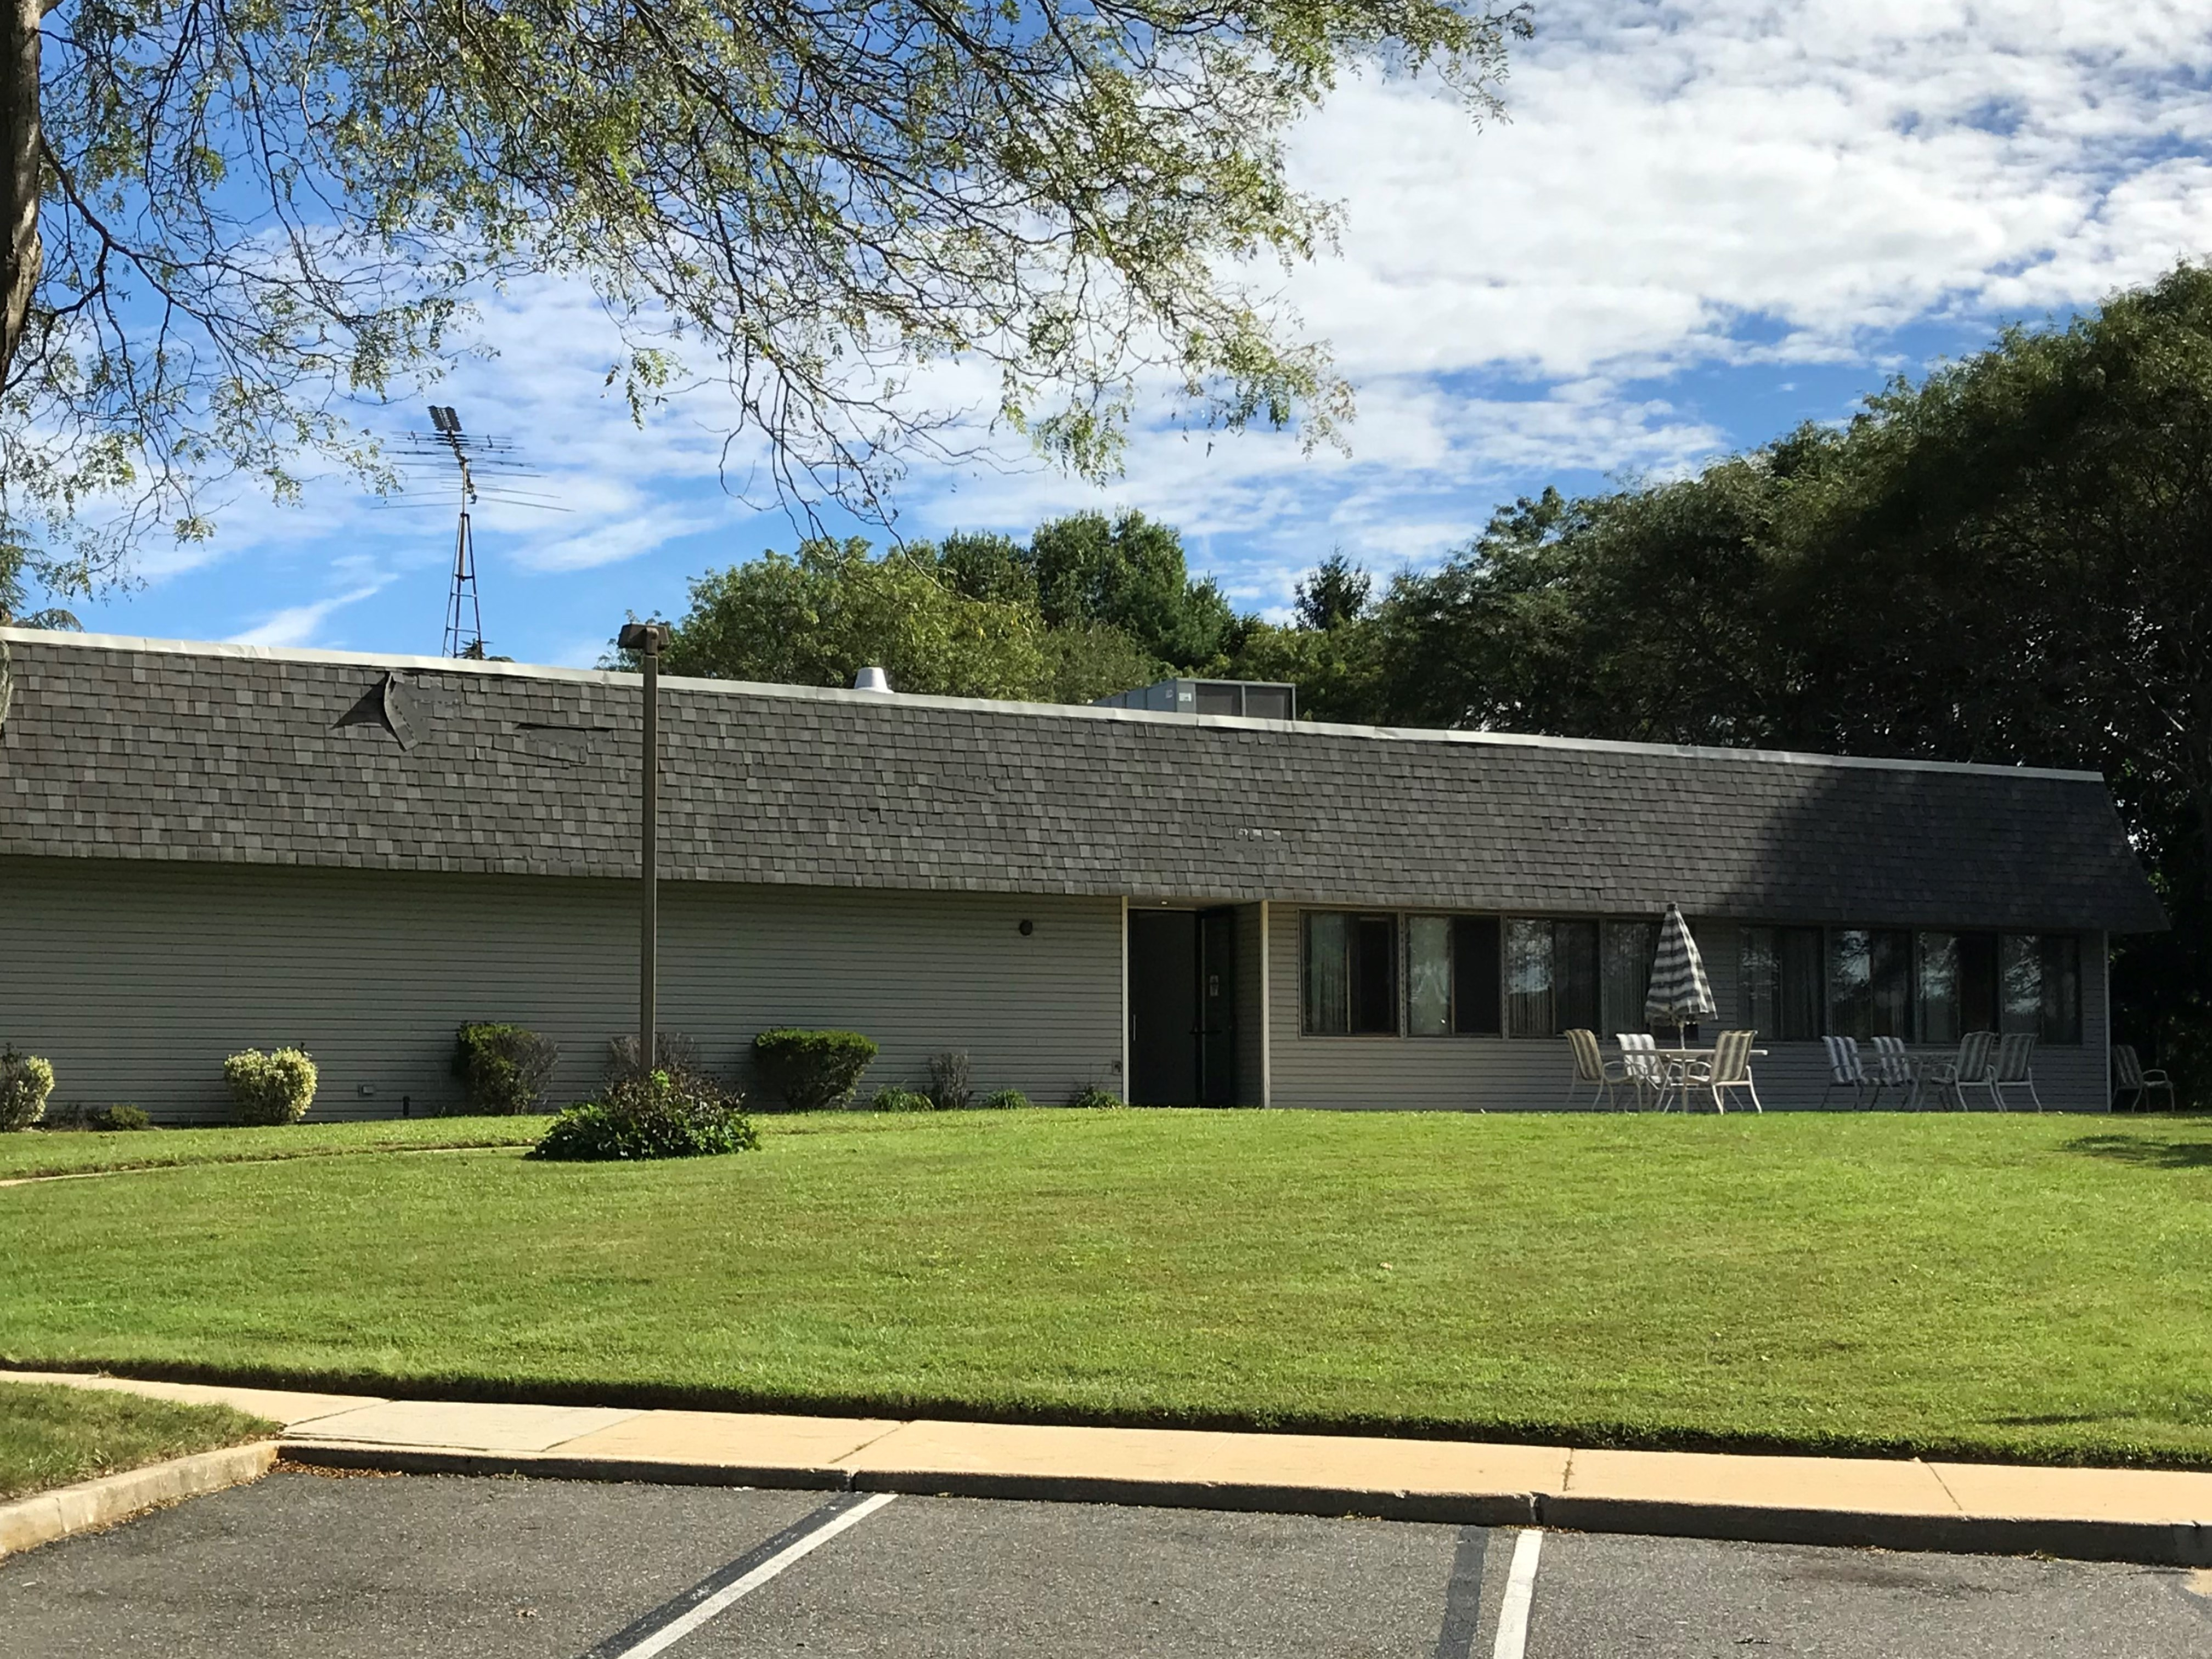 Community Building Rear